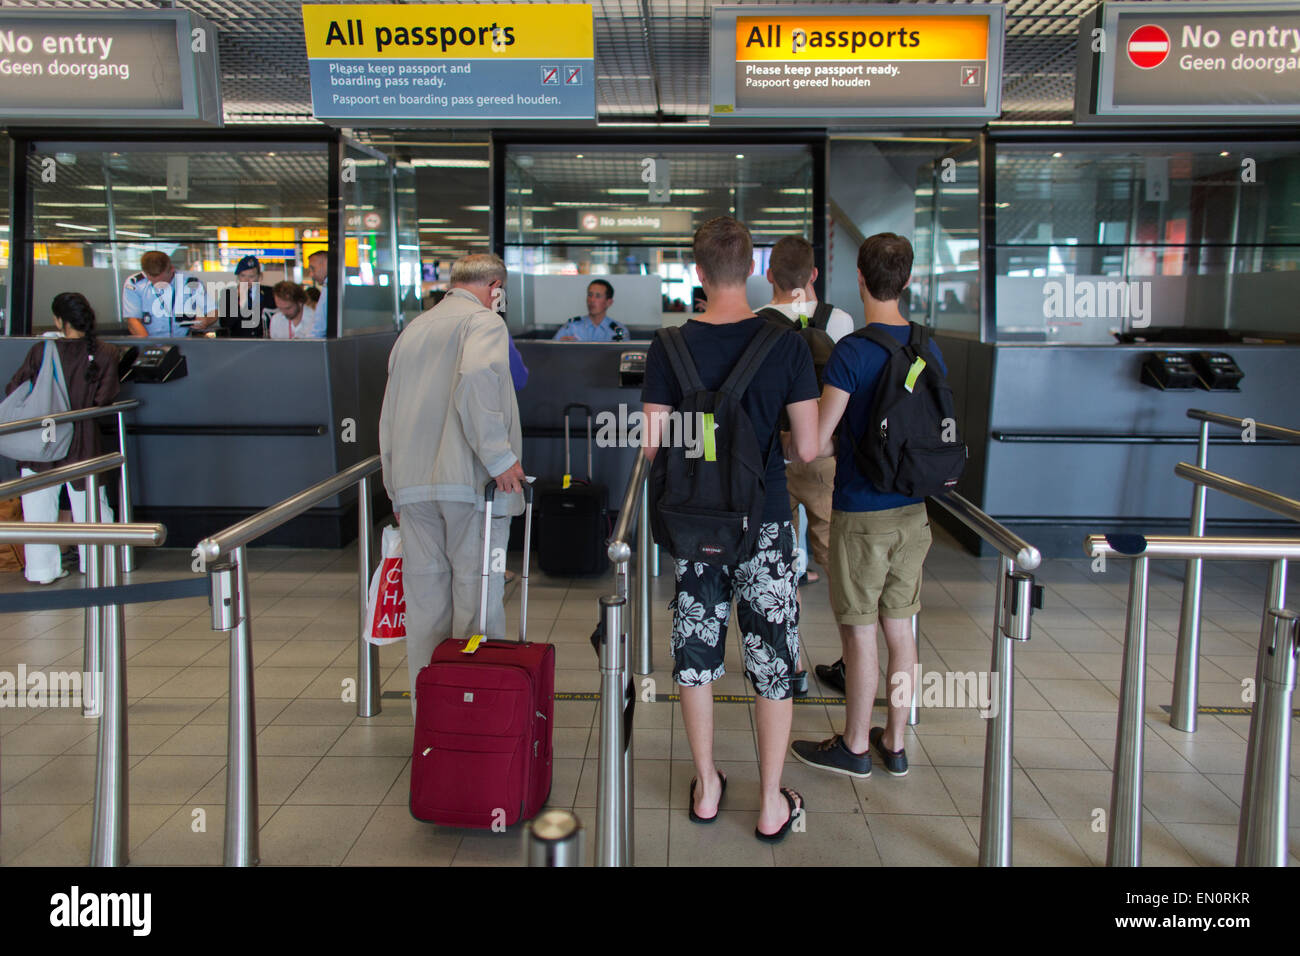 passport-control-at-schiphol-airport-EN0